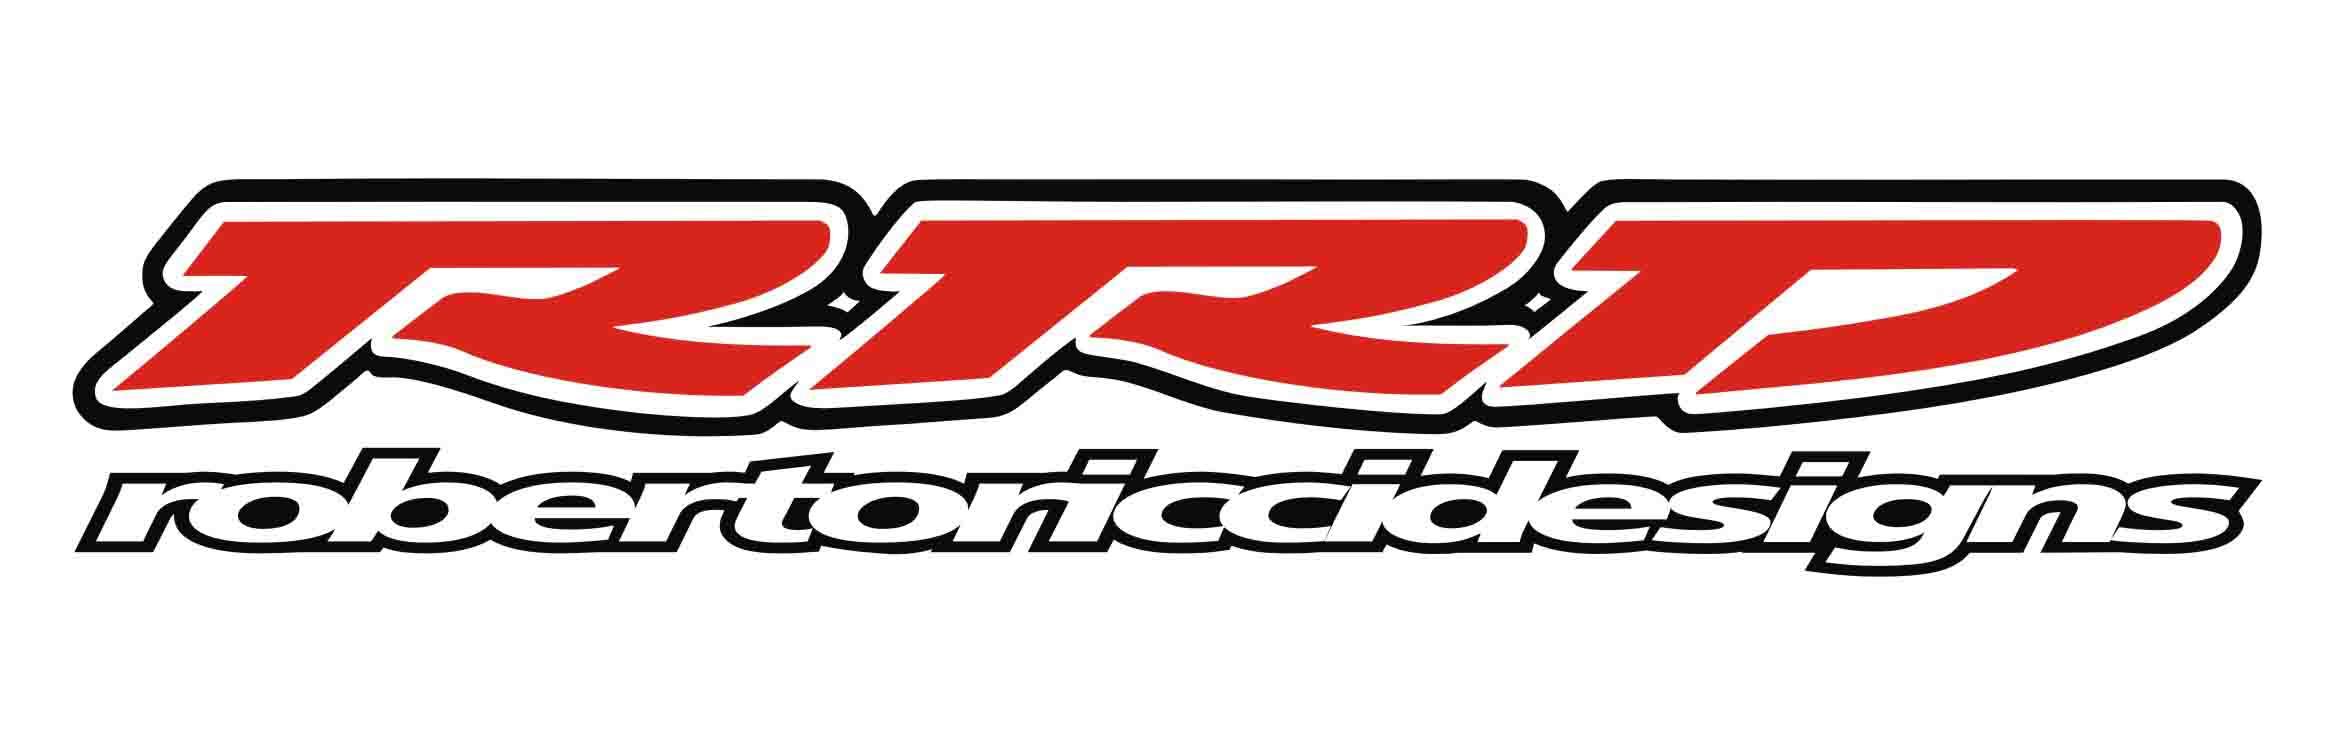 rrd italian Kitesurf brand